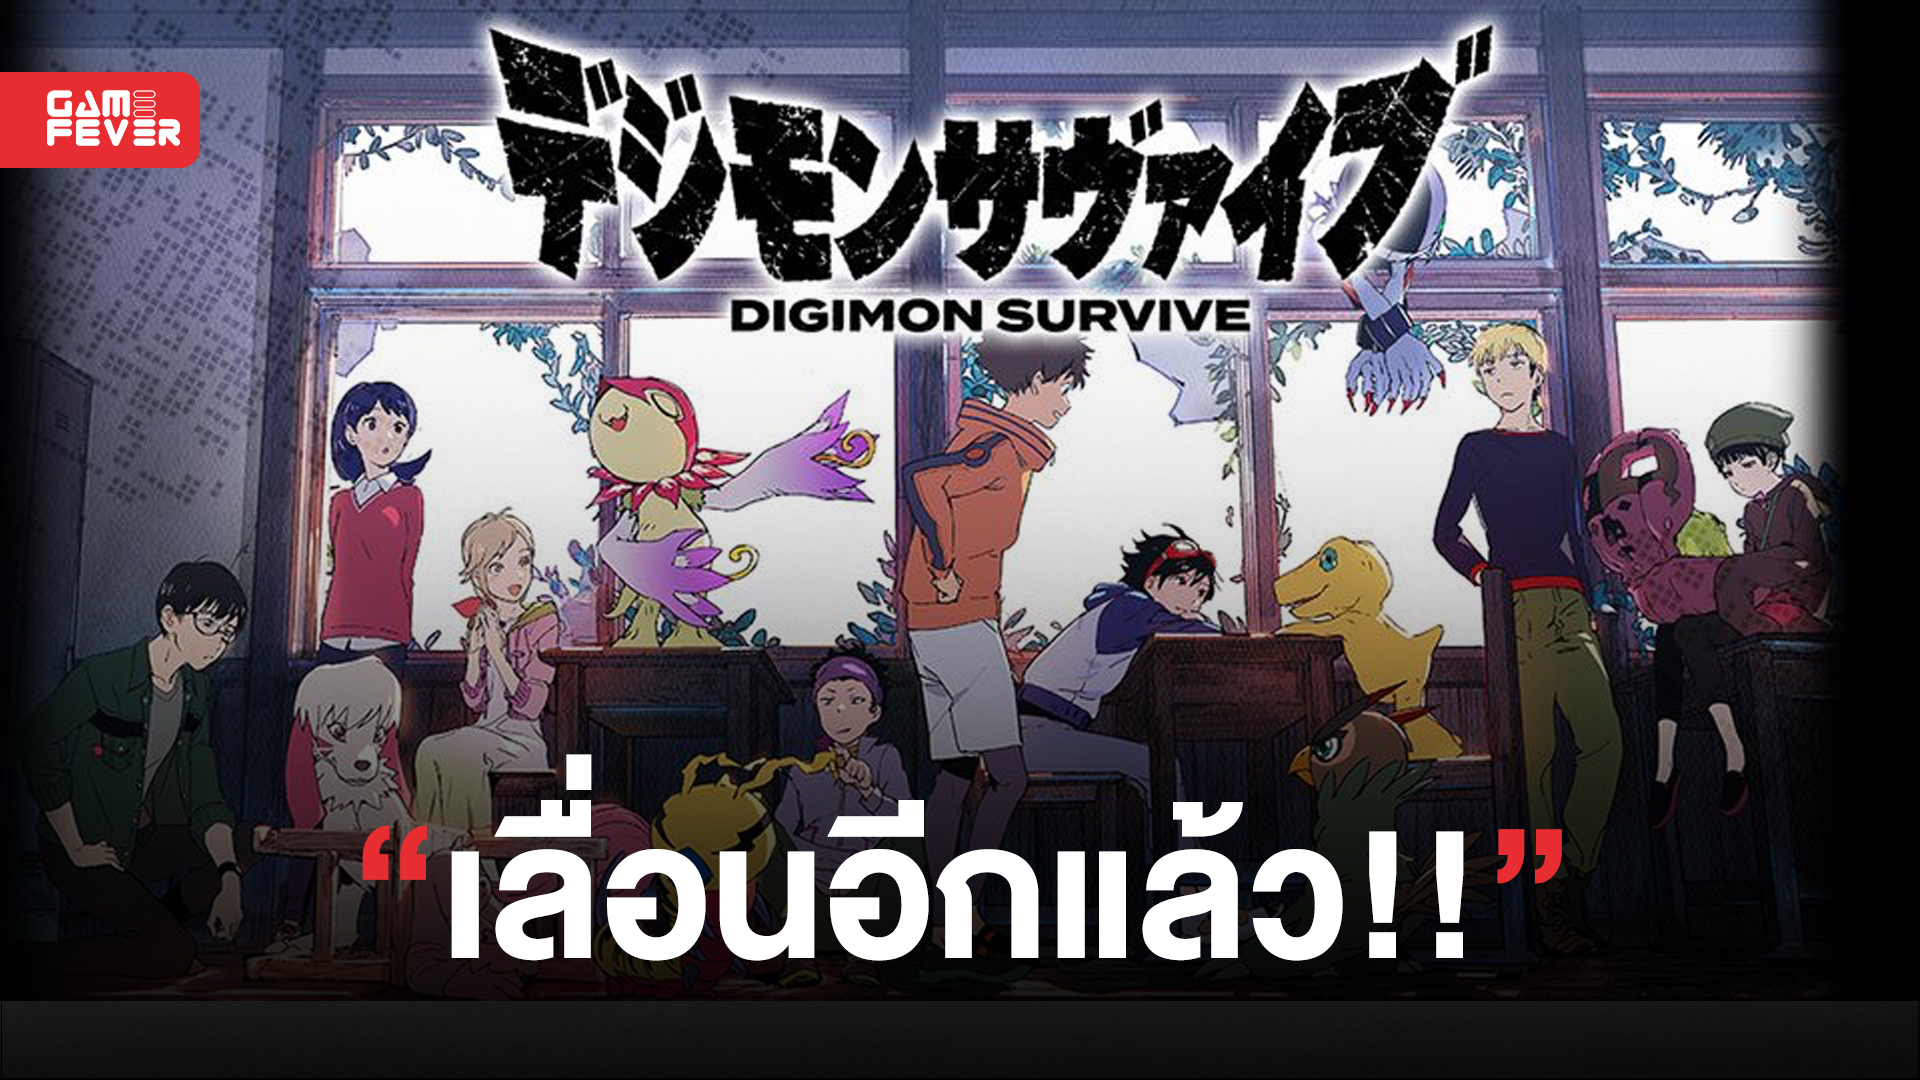 Digimon Survive เลื่อนวางจำหน่ายอีกครั้งไปเป็นปี 2022